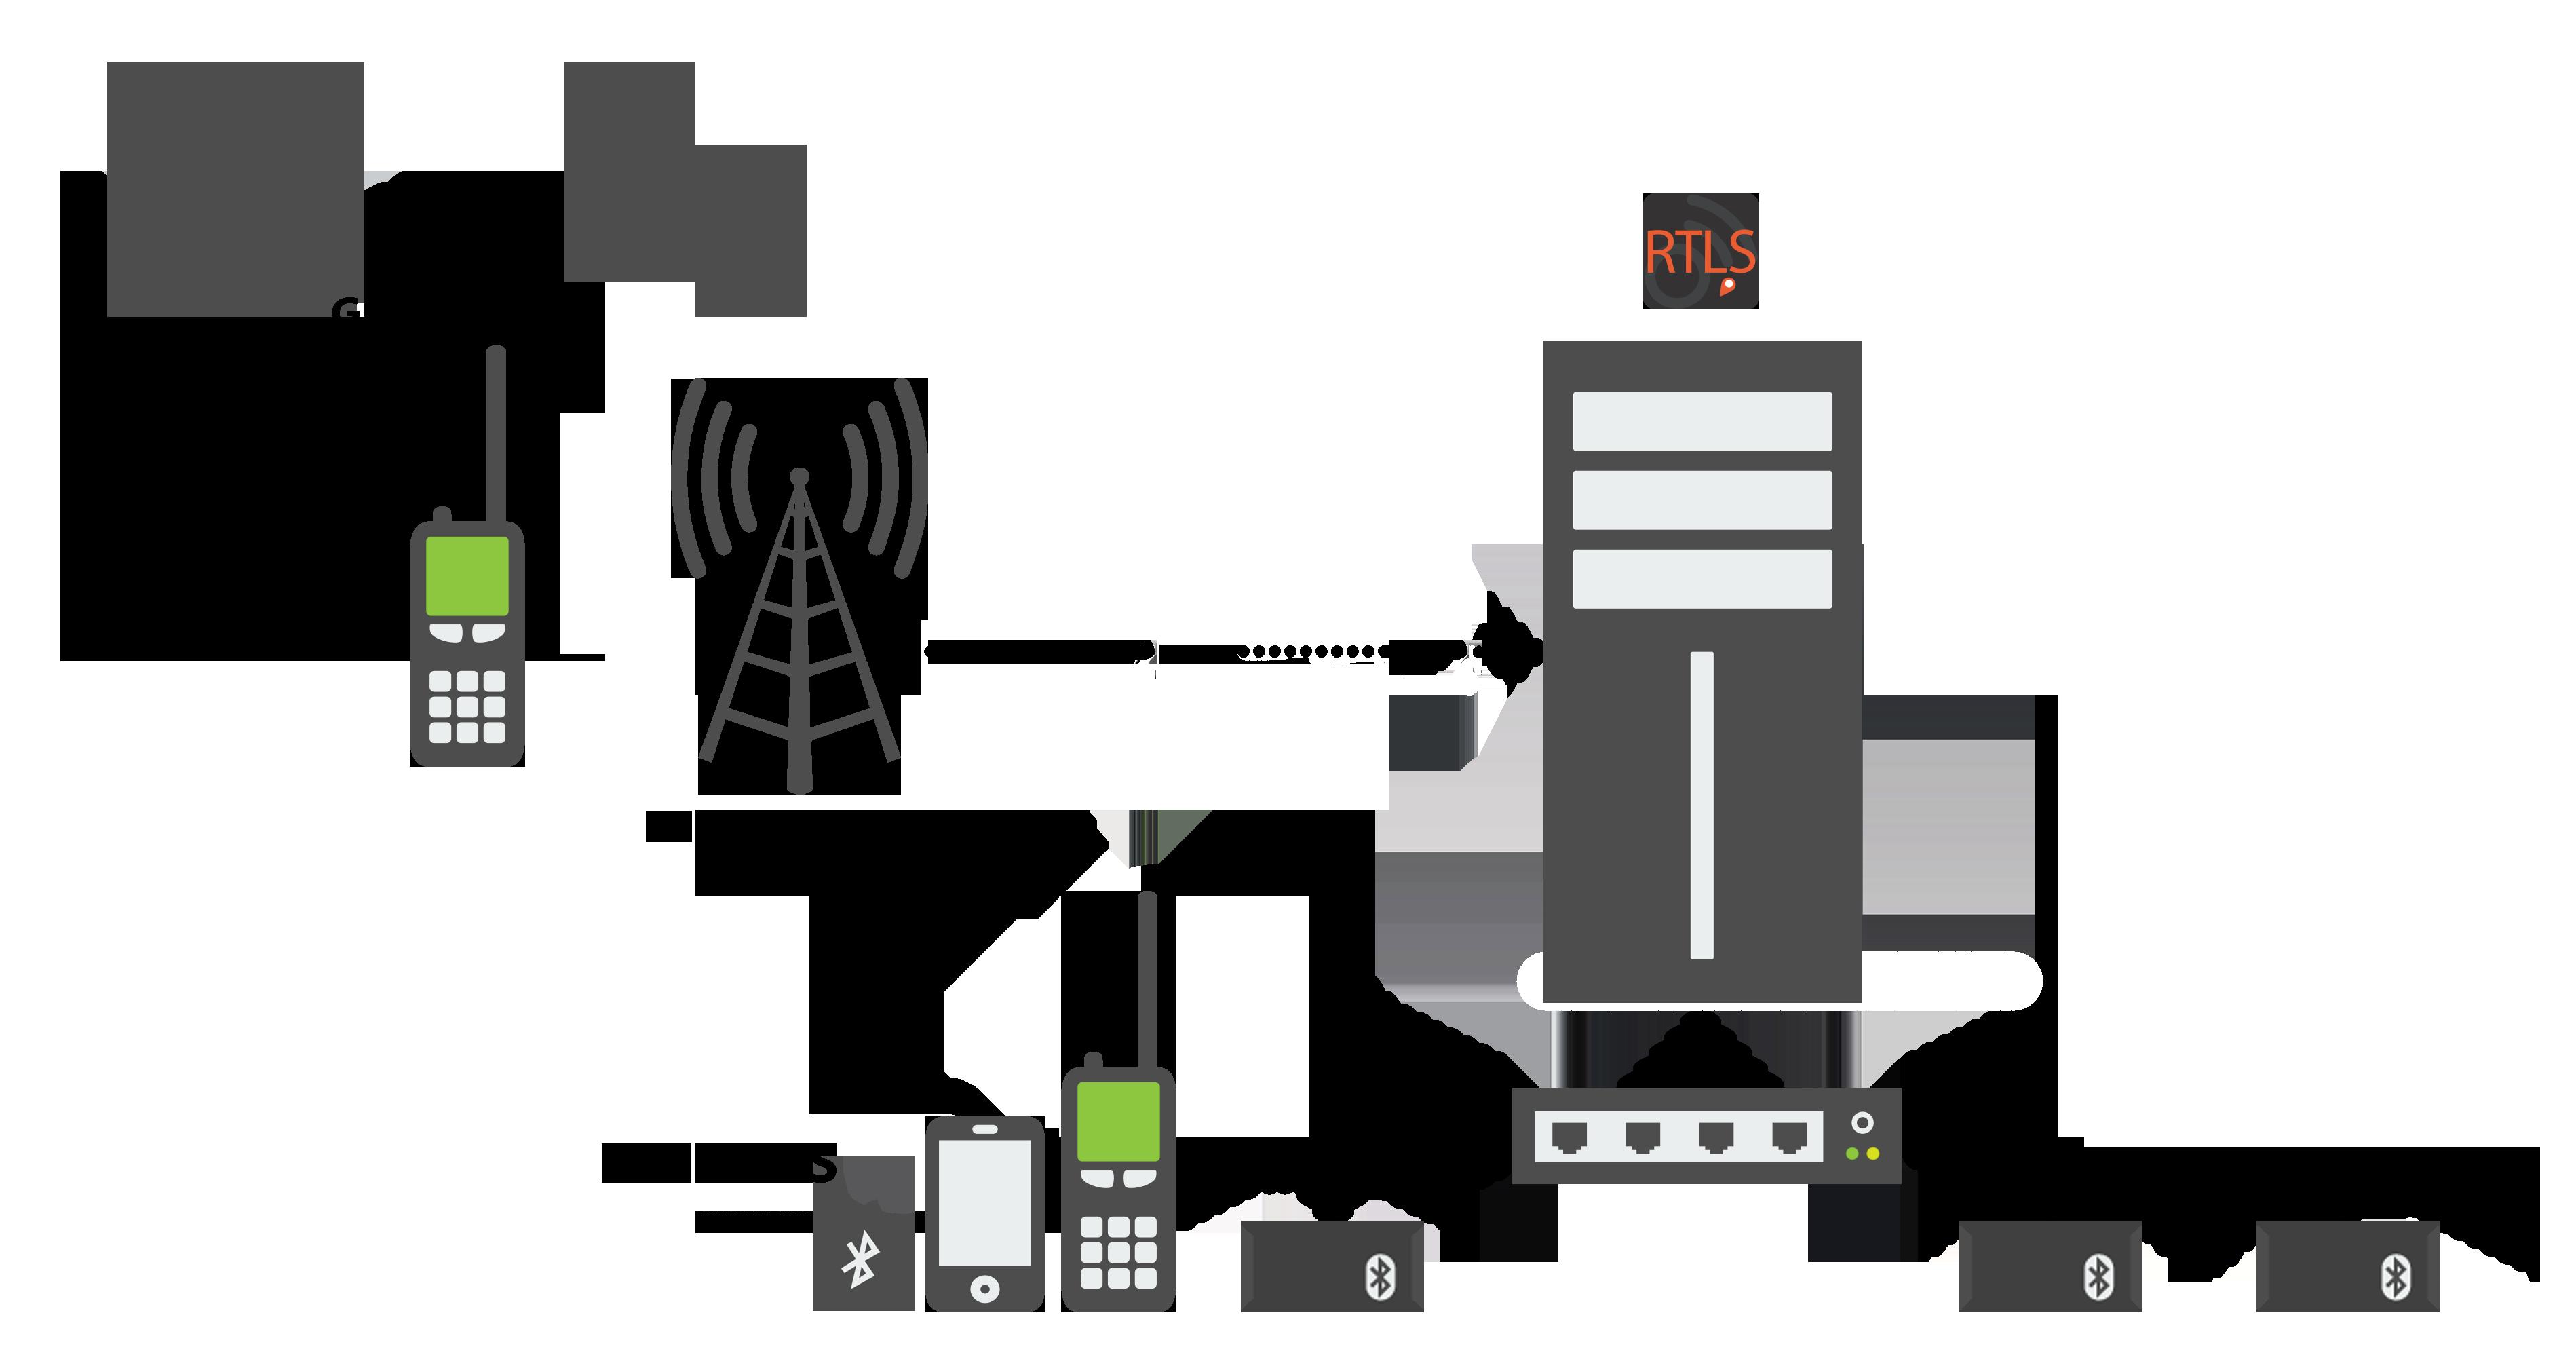 RTLS-Infrastructure